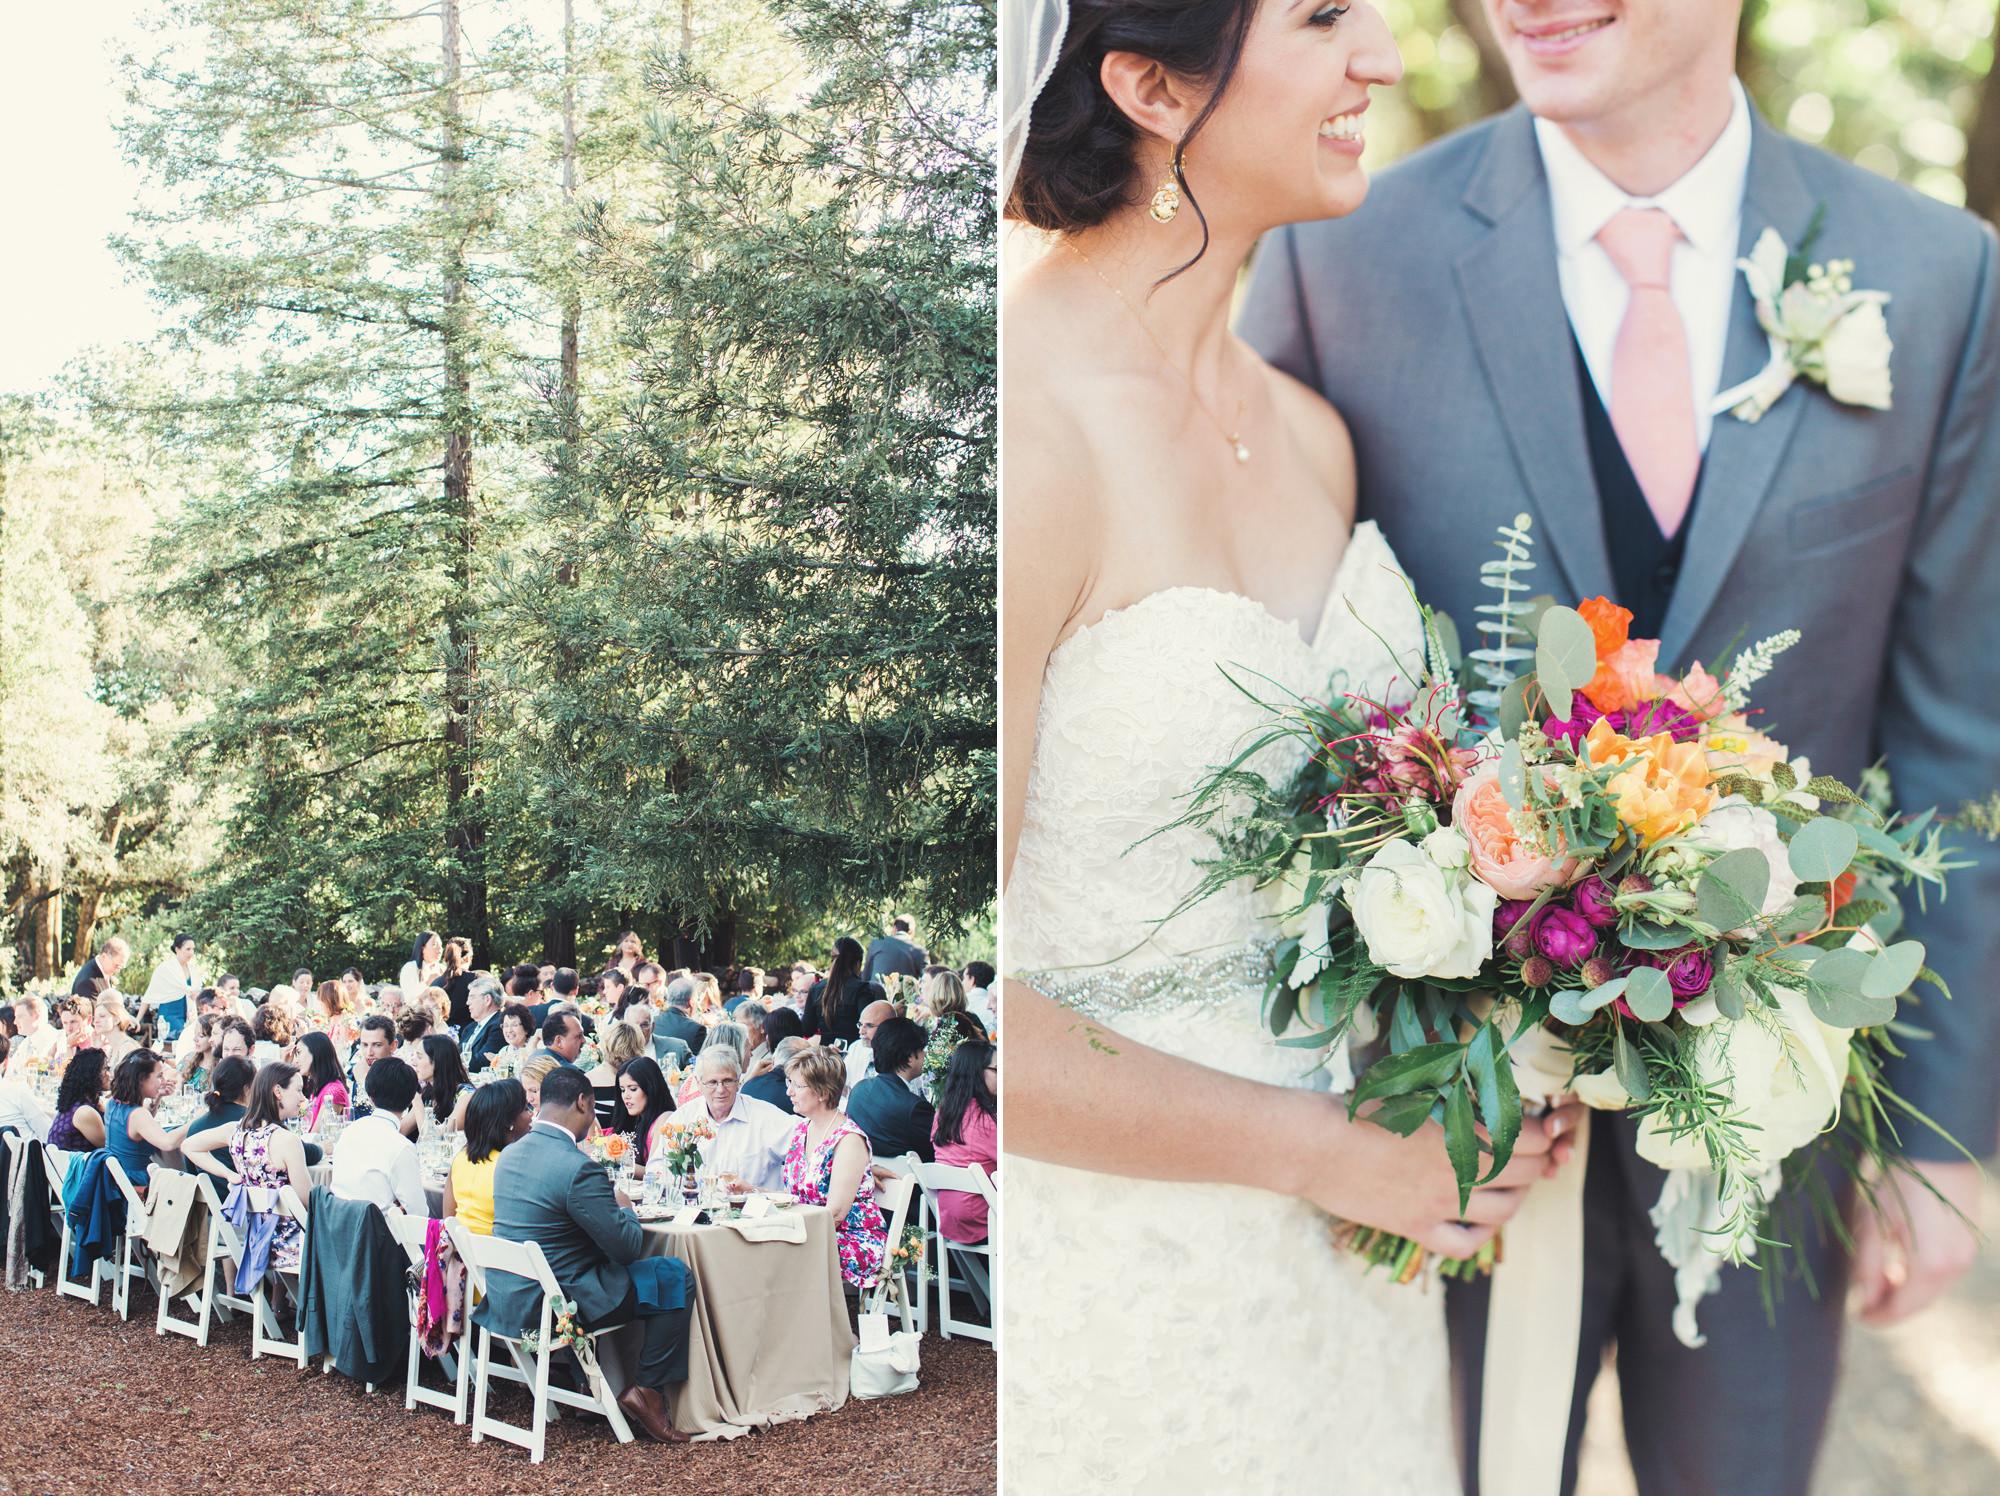 Backyard Wedding in California©Anne-Claire Brun 0022